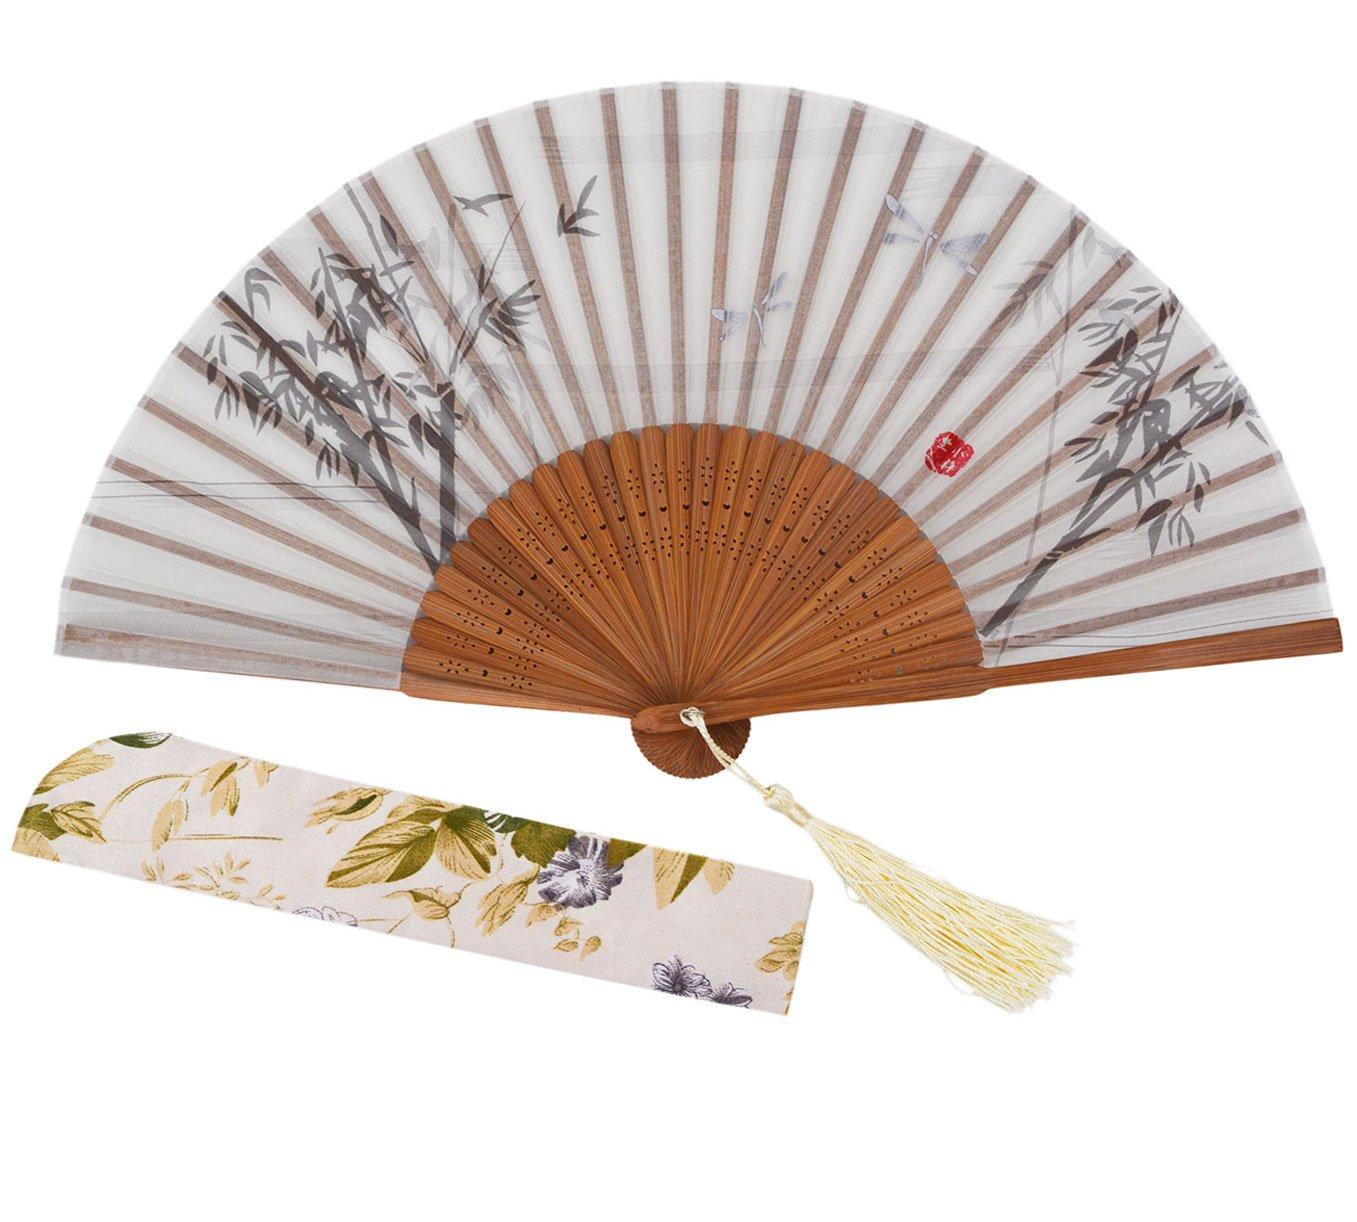 Meifan Chinese Vintage Retro Style Handheld Folding Fan (White)